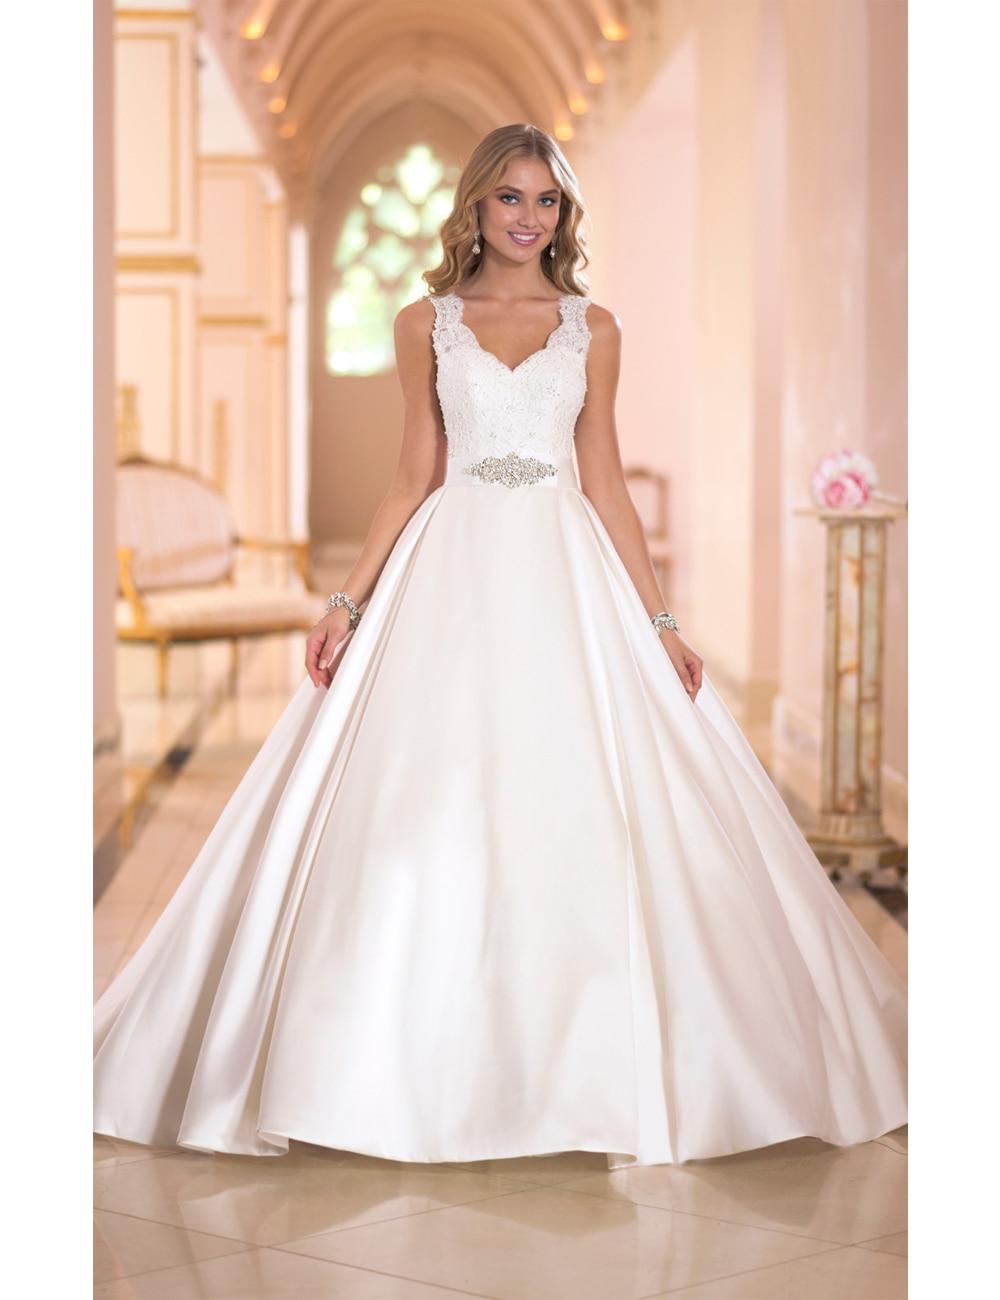 2016 Handmade Custom Designed Dramatic Luxury Ball Gown Princess ...